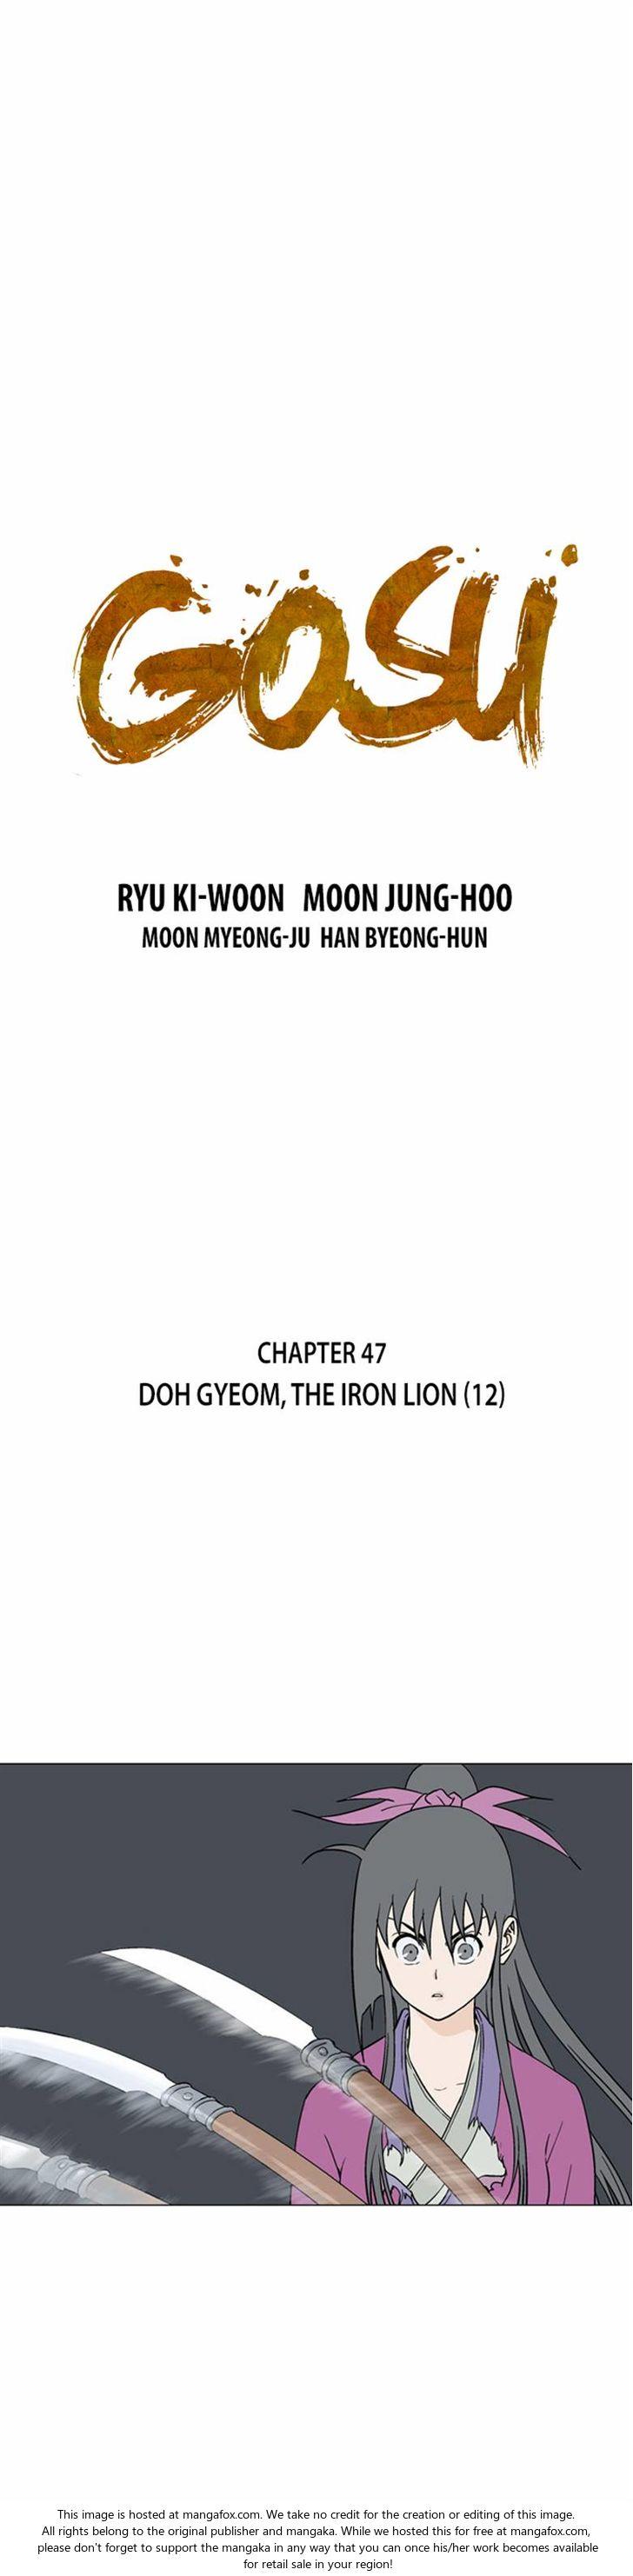 Gosu 47: Doh Gyeom, the Iron Lion (12) at MangaFox.la